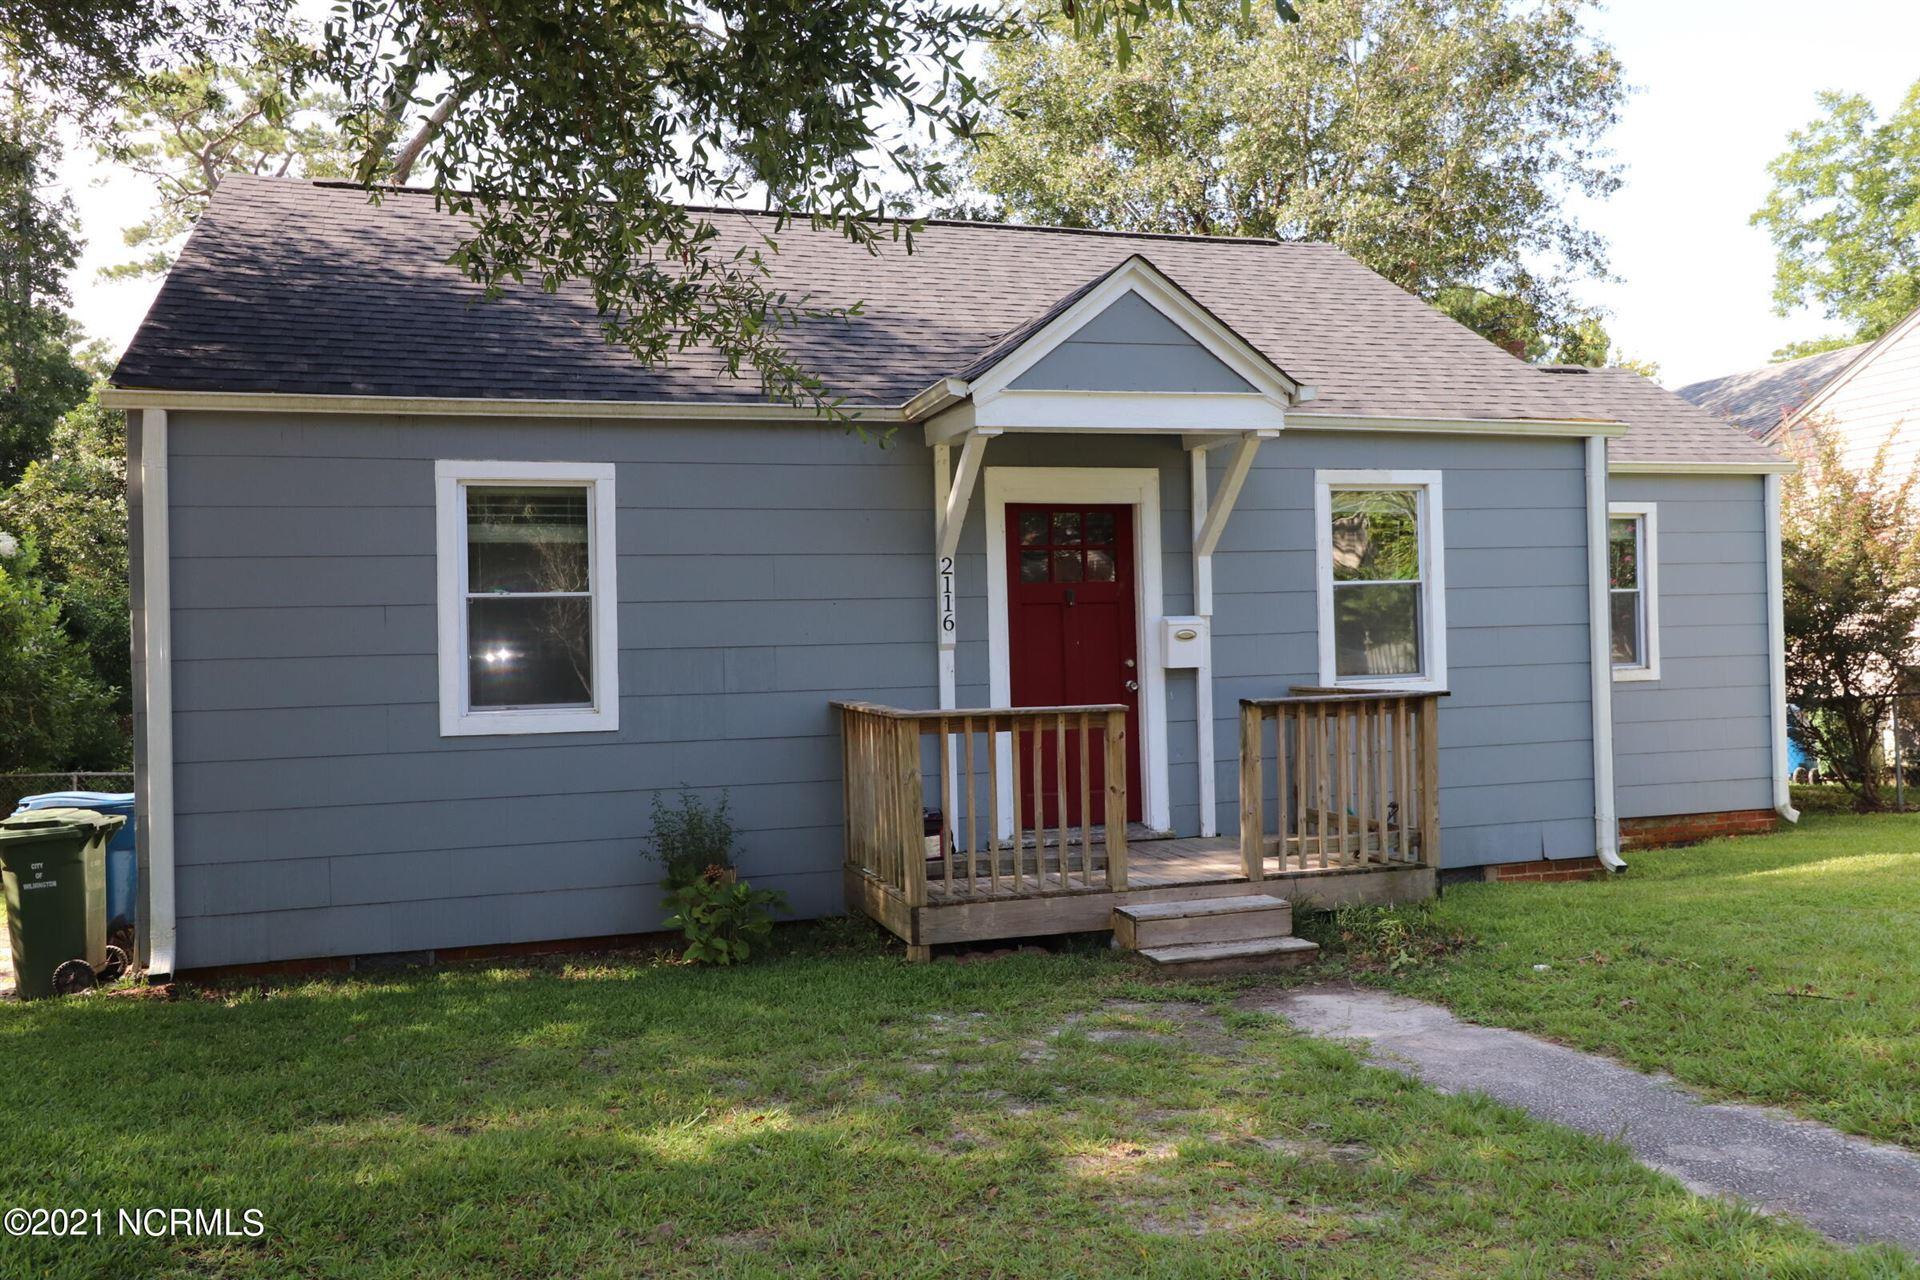 Photo of 2116 Brandon Road, Wilmington, NC 28405 (MLS # 100287618)